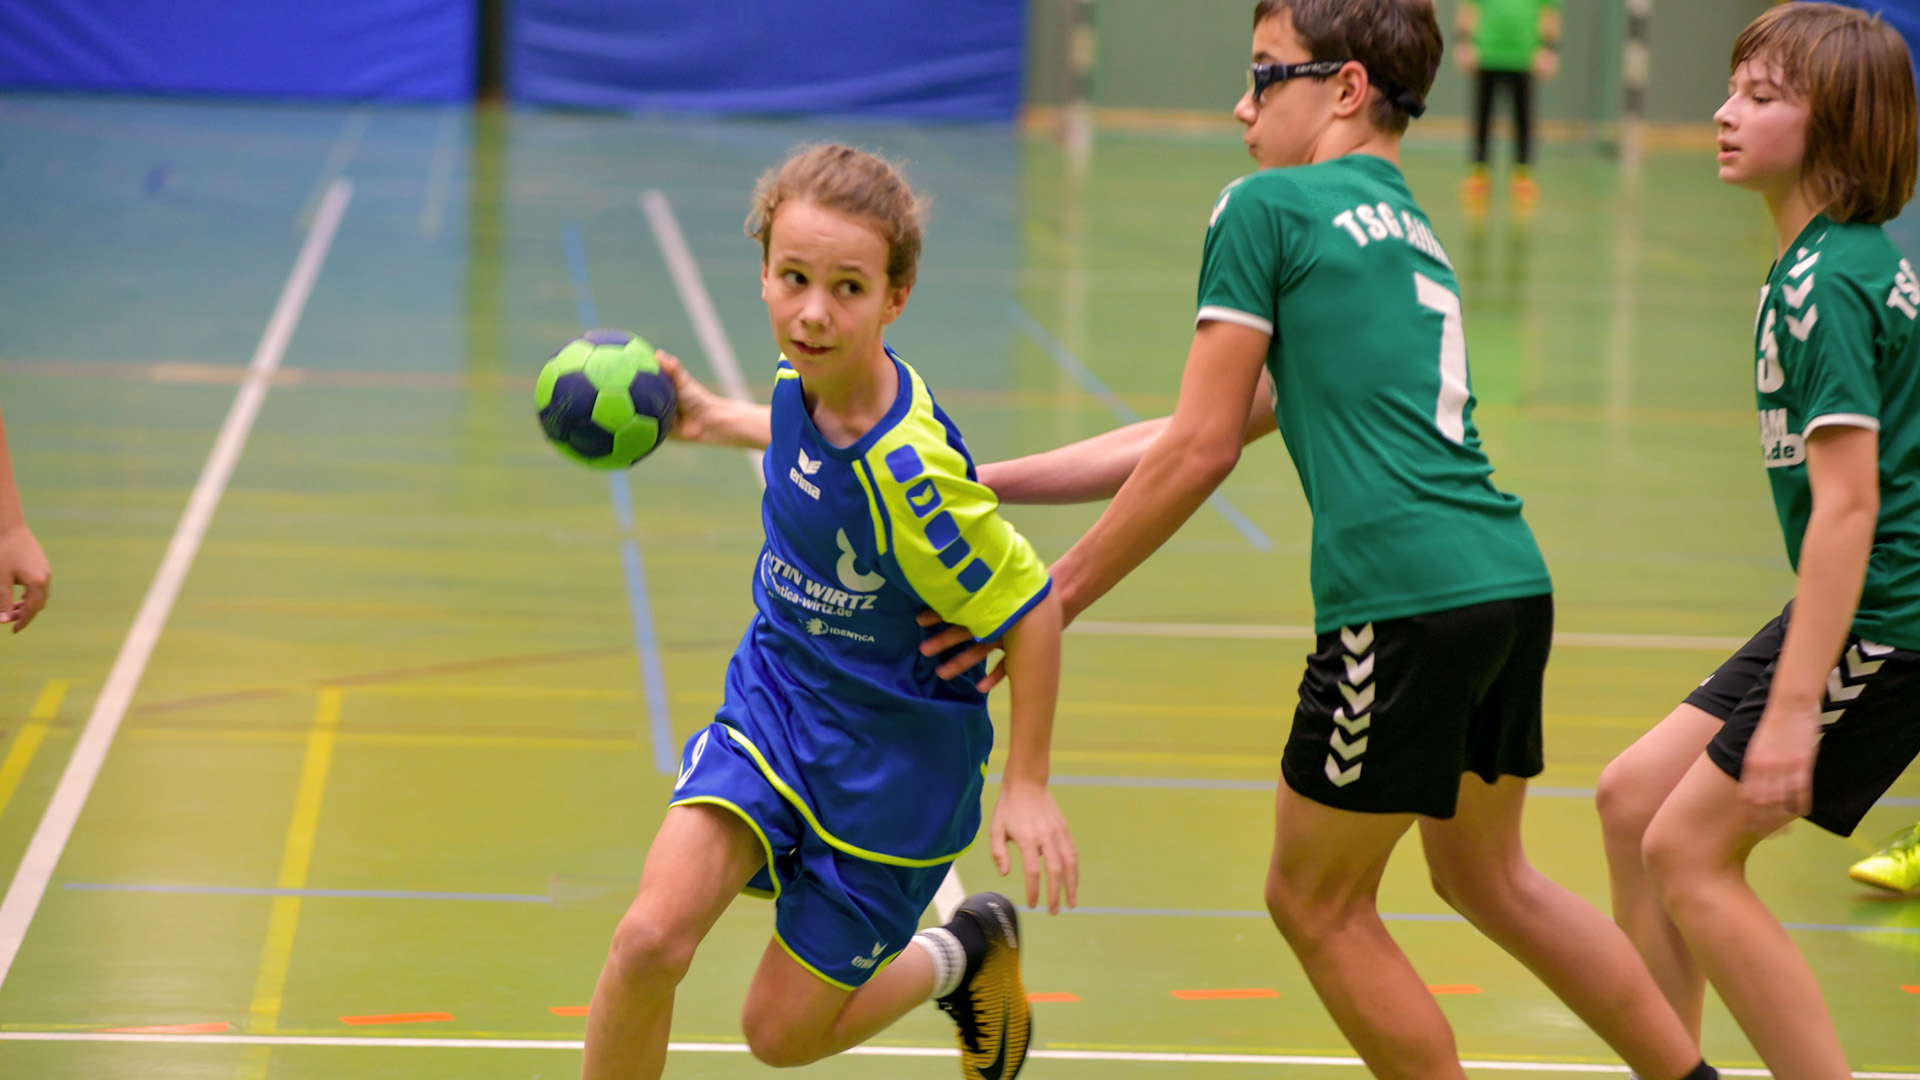 020Slider_mD_tsg_leutkirch_handball